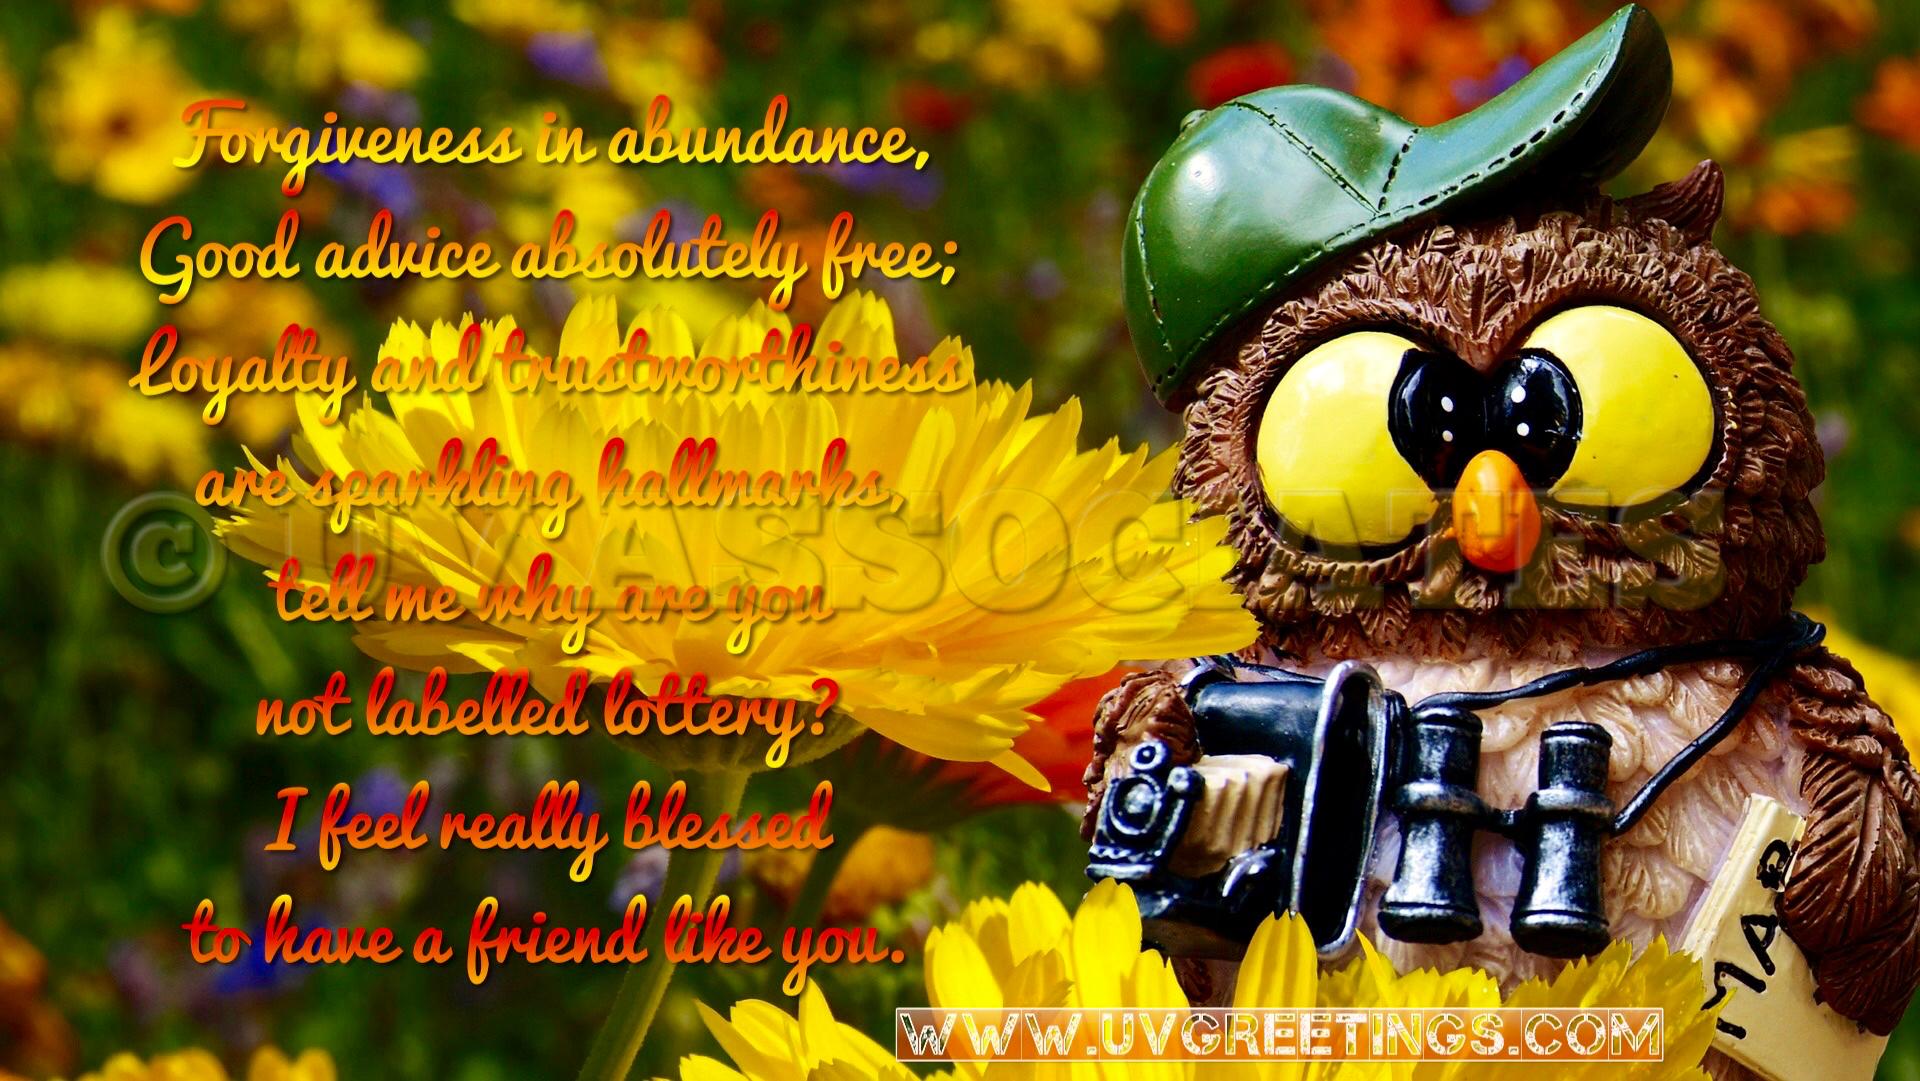 Thank You Friend - eCard bright yellow flowers, Owl